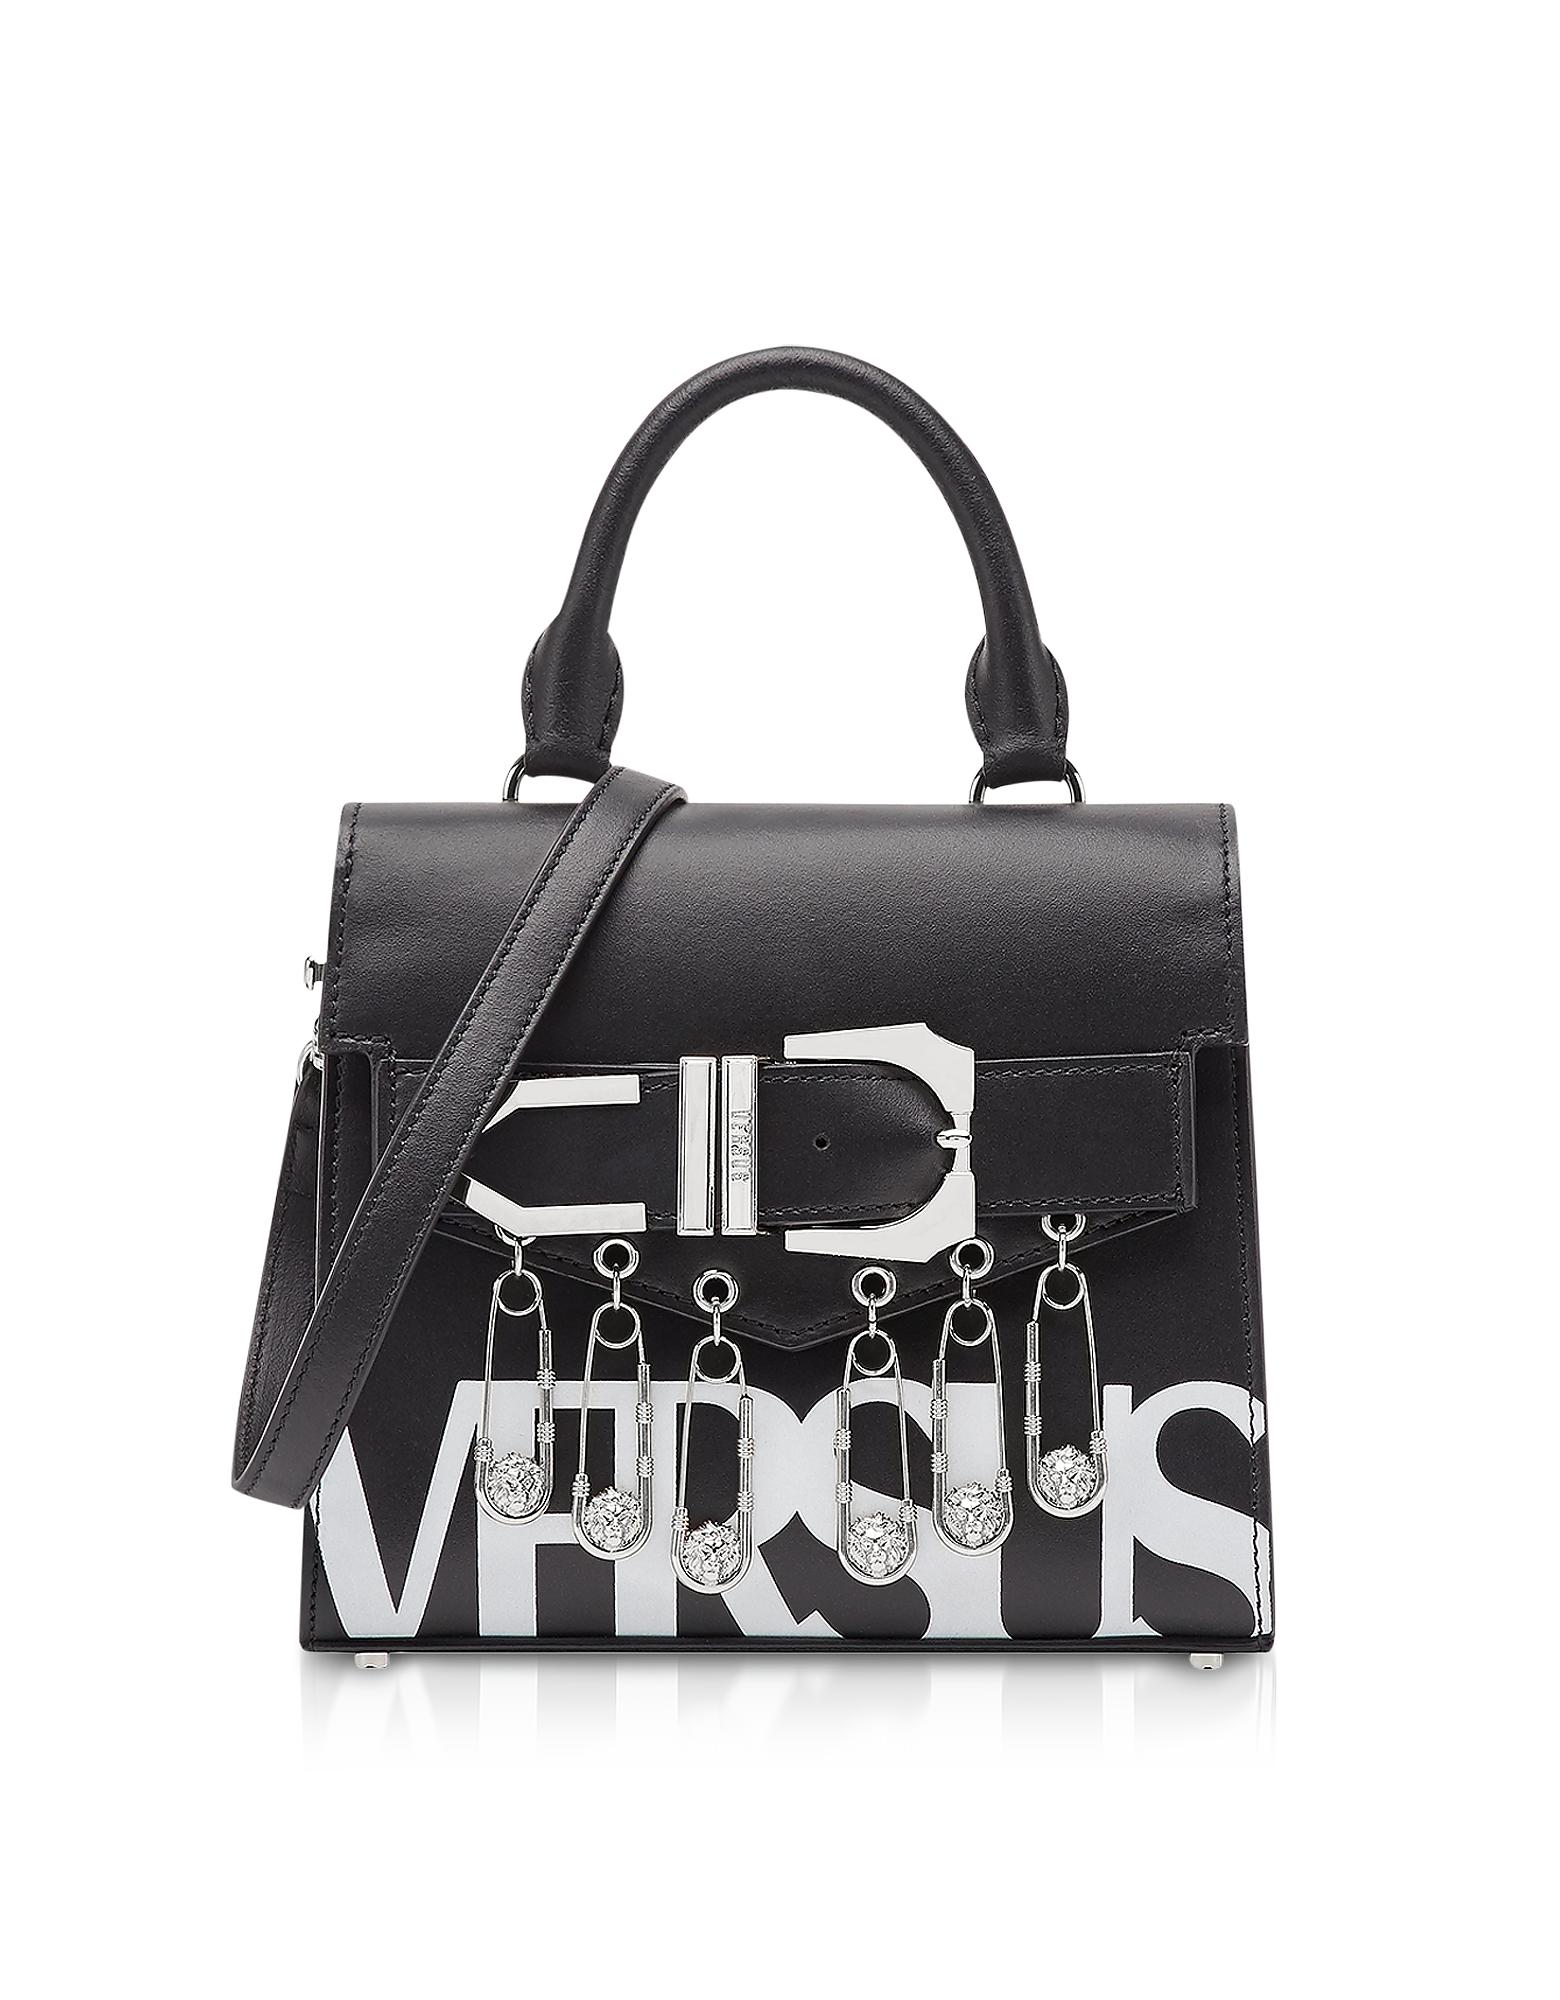 Image of Versace Versus Designer Handbags, Black/Optic White Leather Versus Vintage Logo Iconic Satchel Bag w/Buckle and Safety Pins